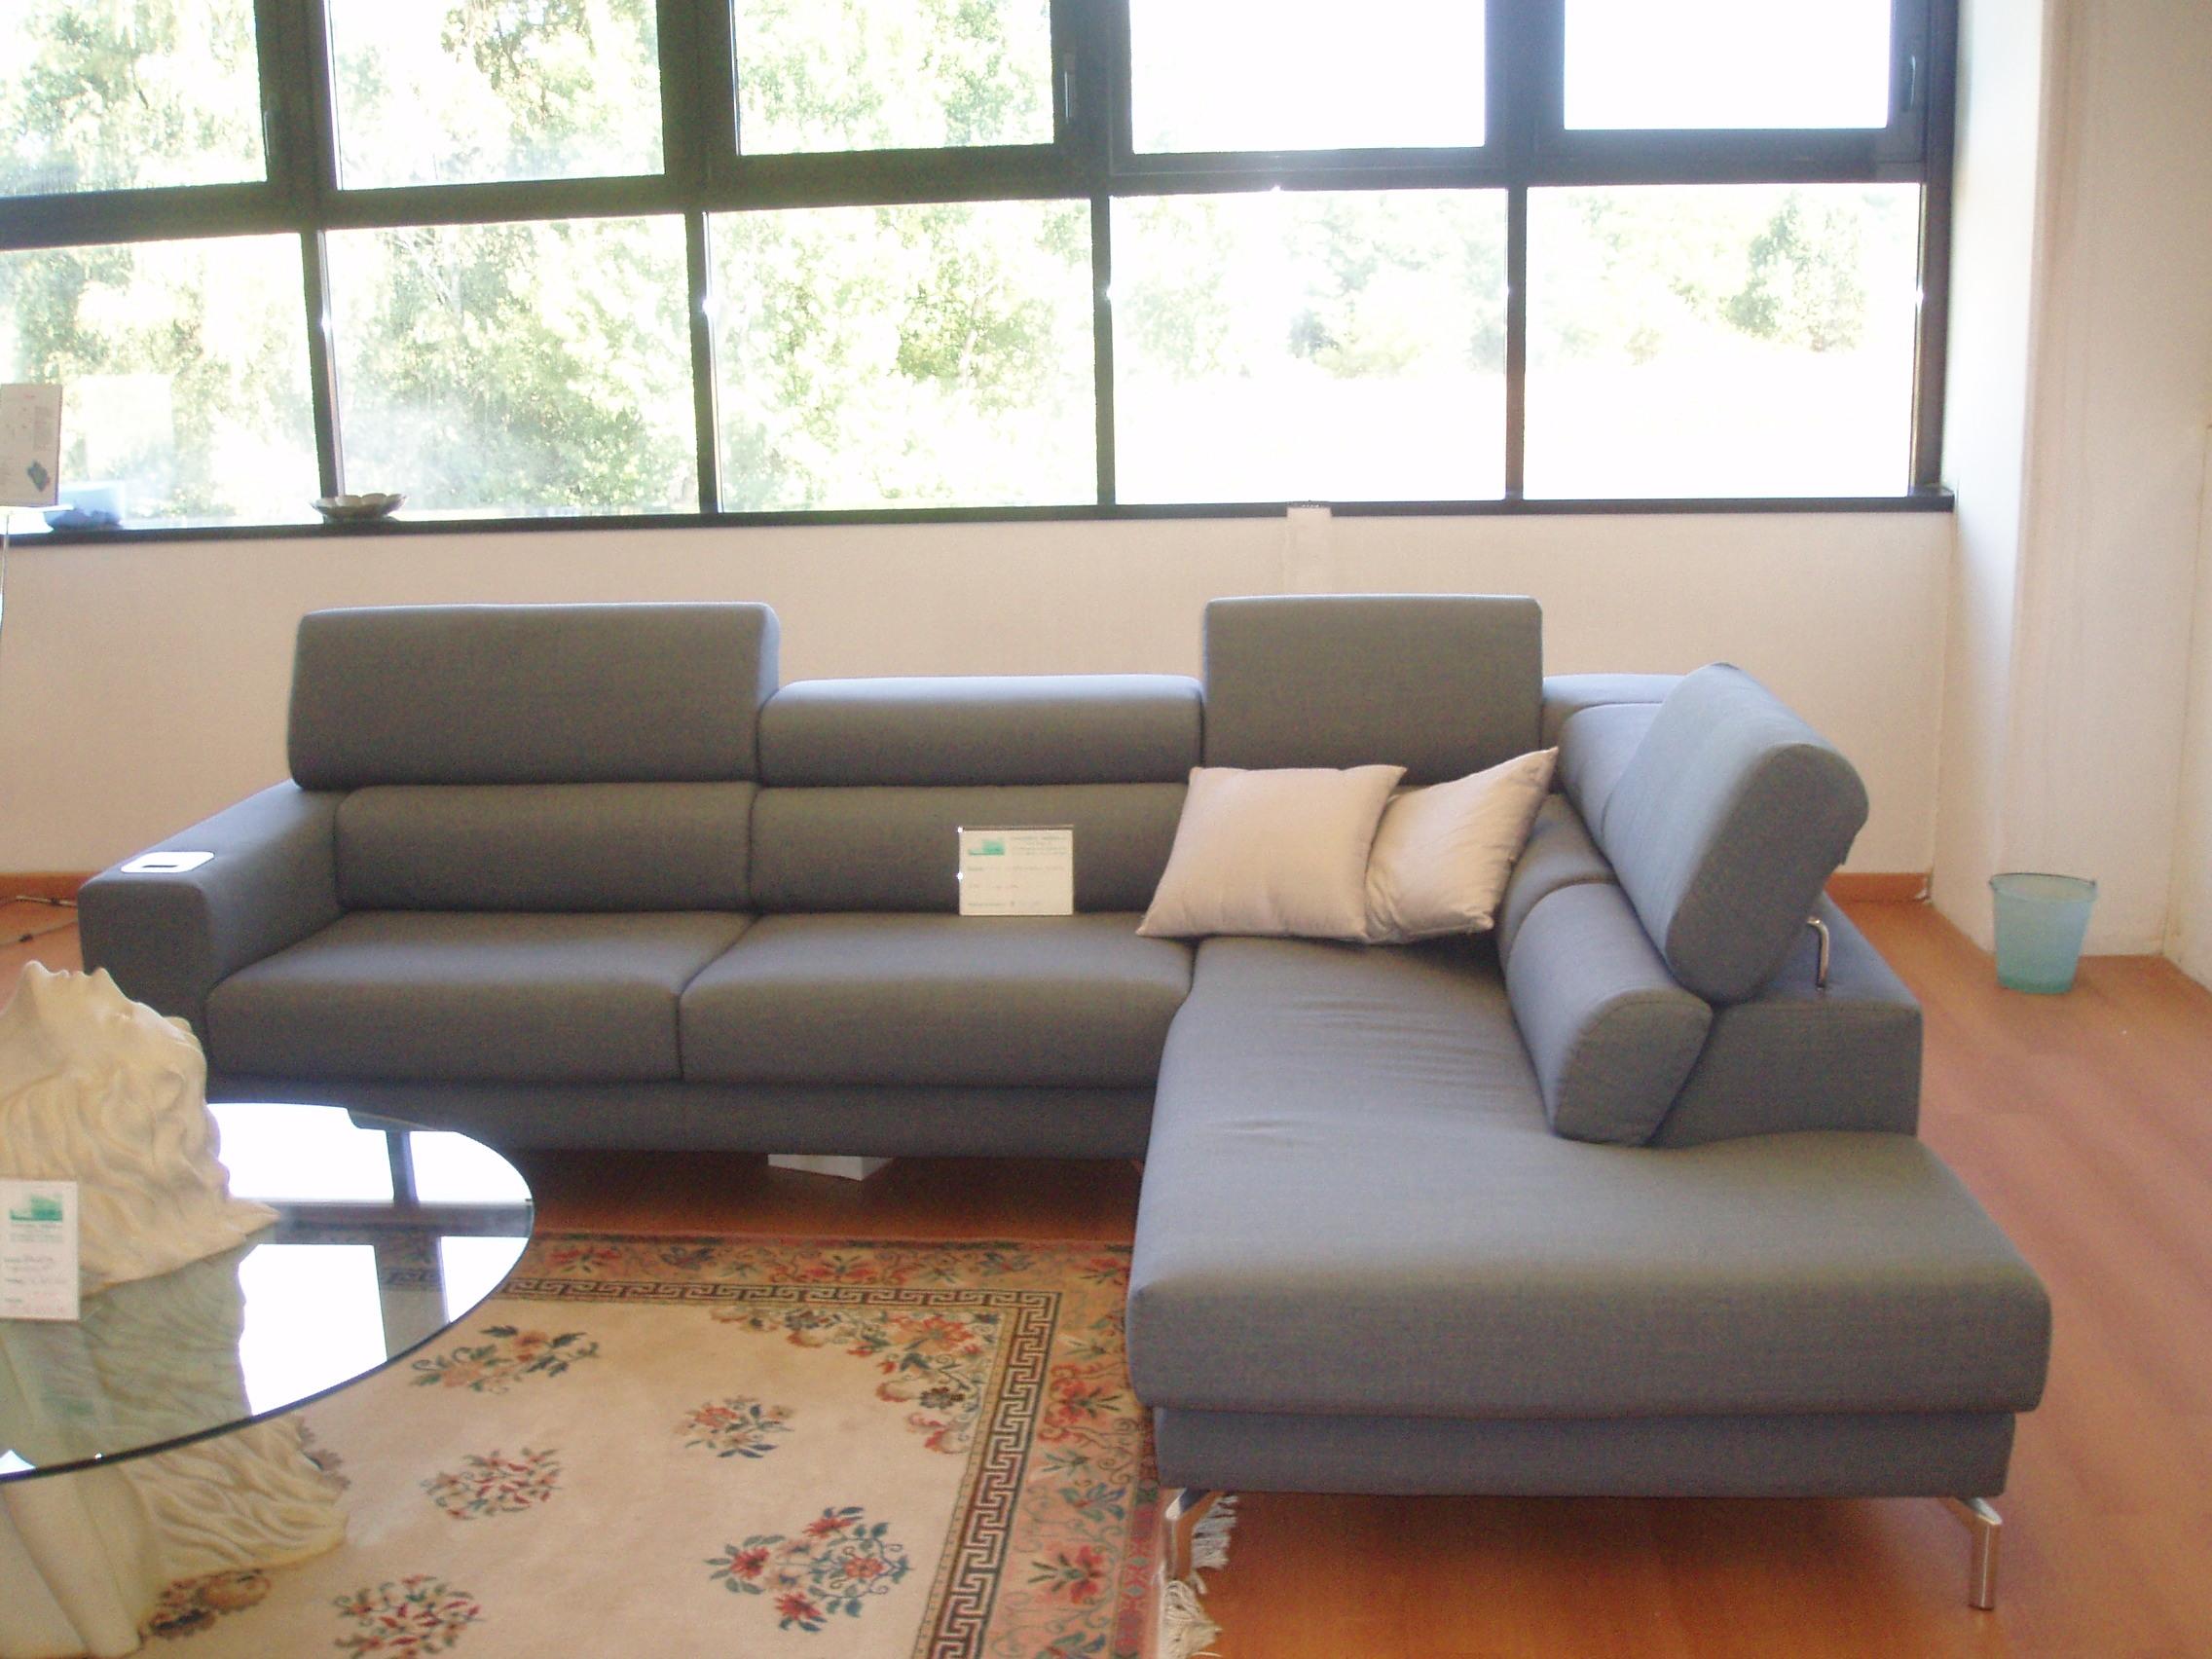 Felix divano dylan chaise longue tessuto divani a prezzi for Divano chaise longue